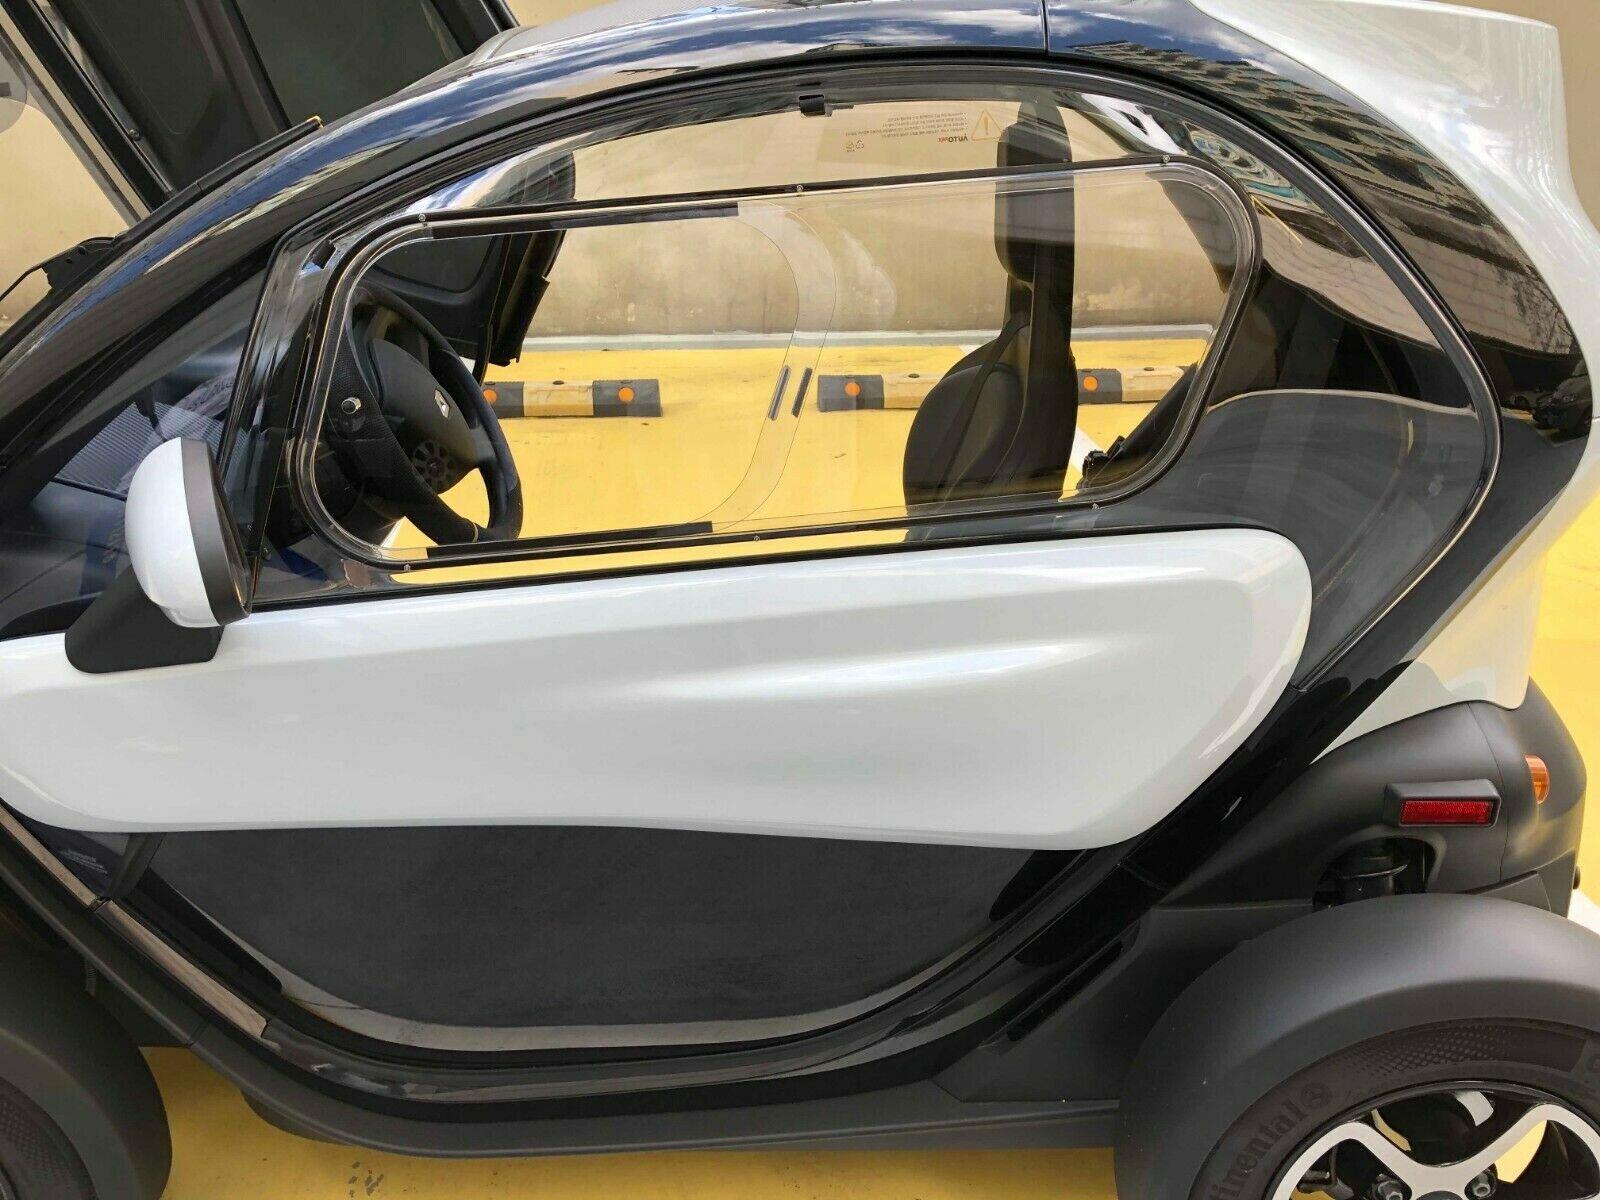 OEM Renault Samsung Windows With Sliding Vents